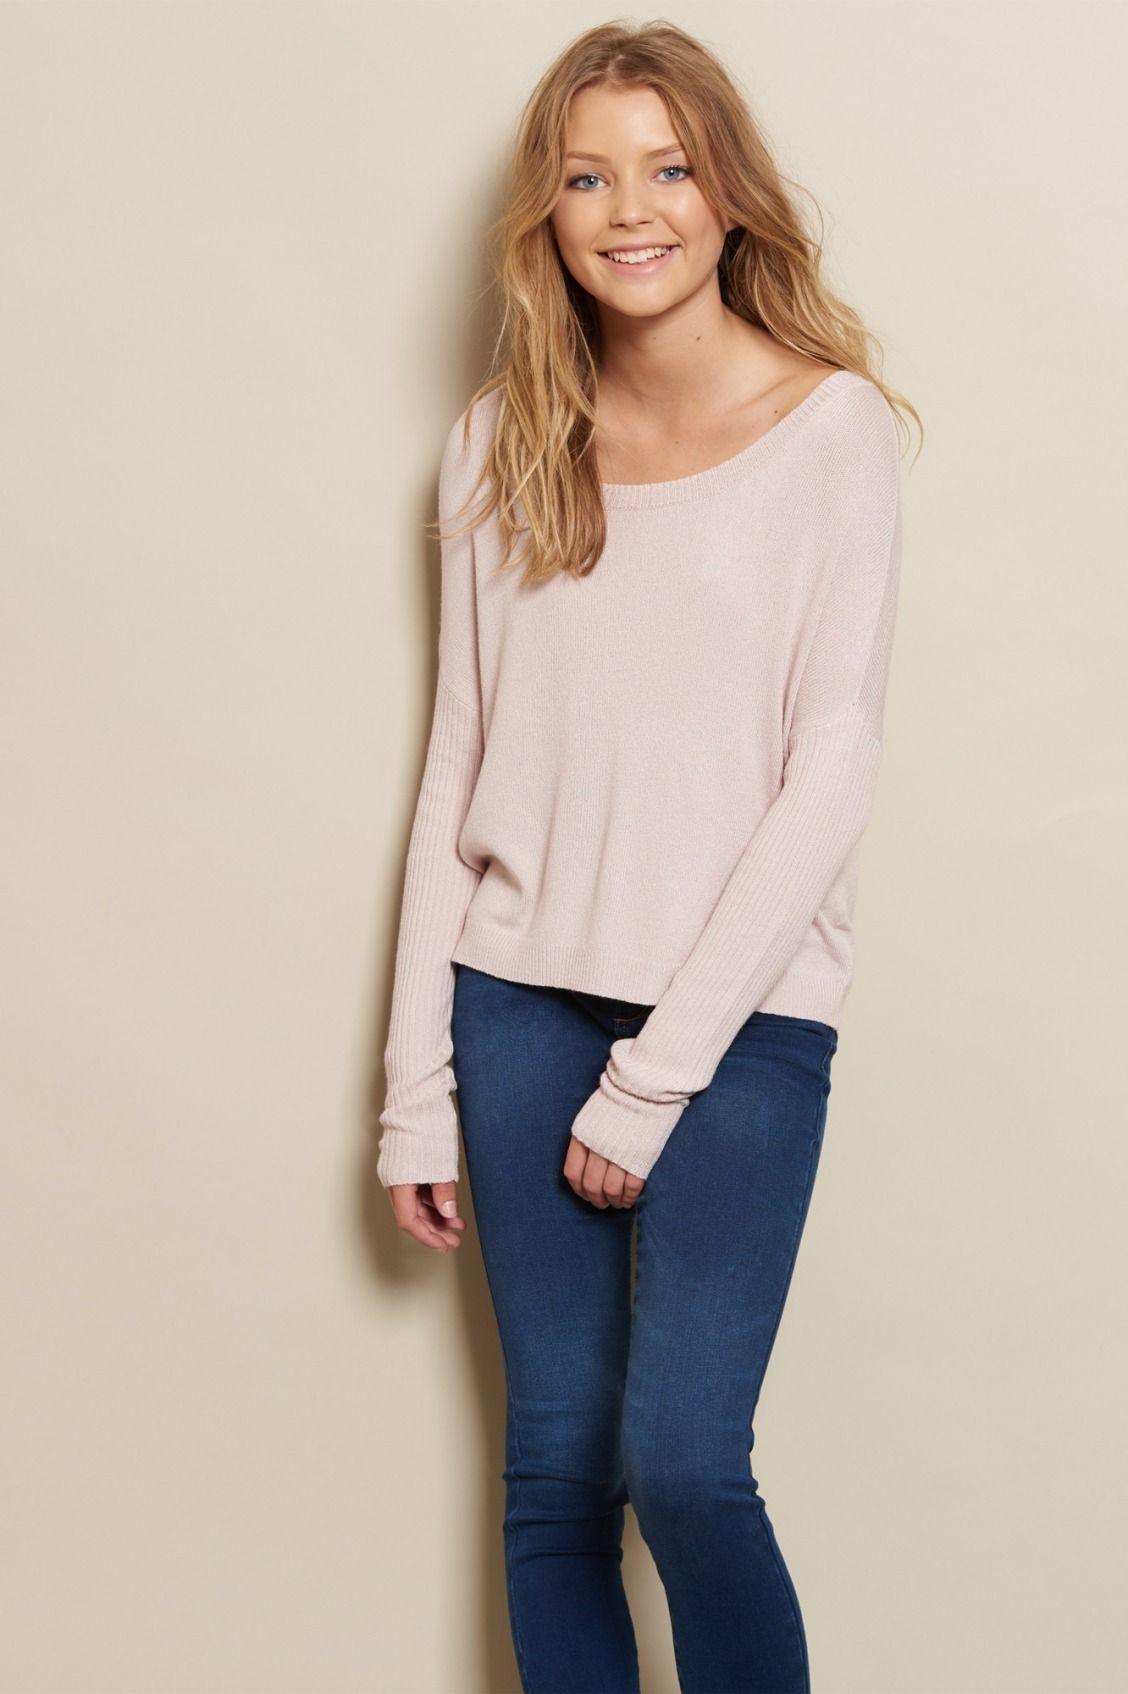 Cozy & cute. Cozy Sweater / Shop the look: https://goo.gl/HpmVfO ...